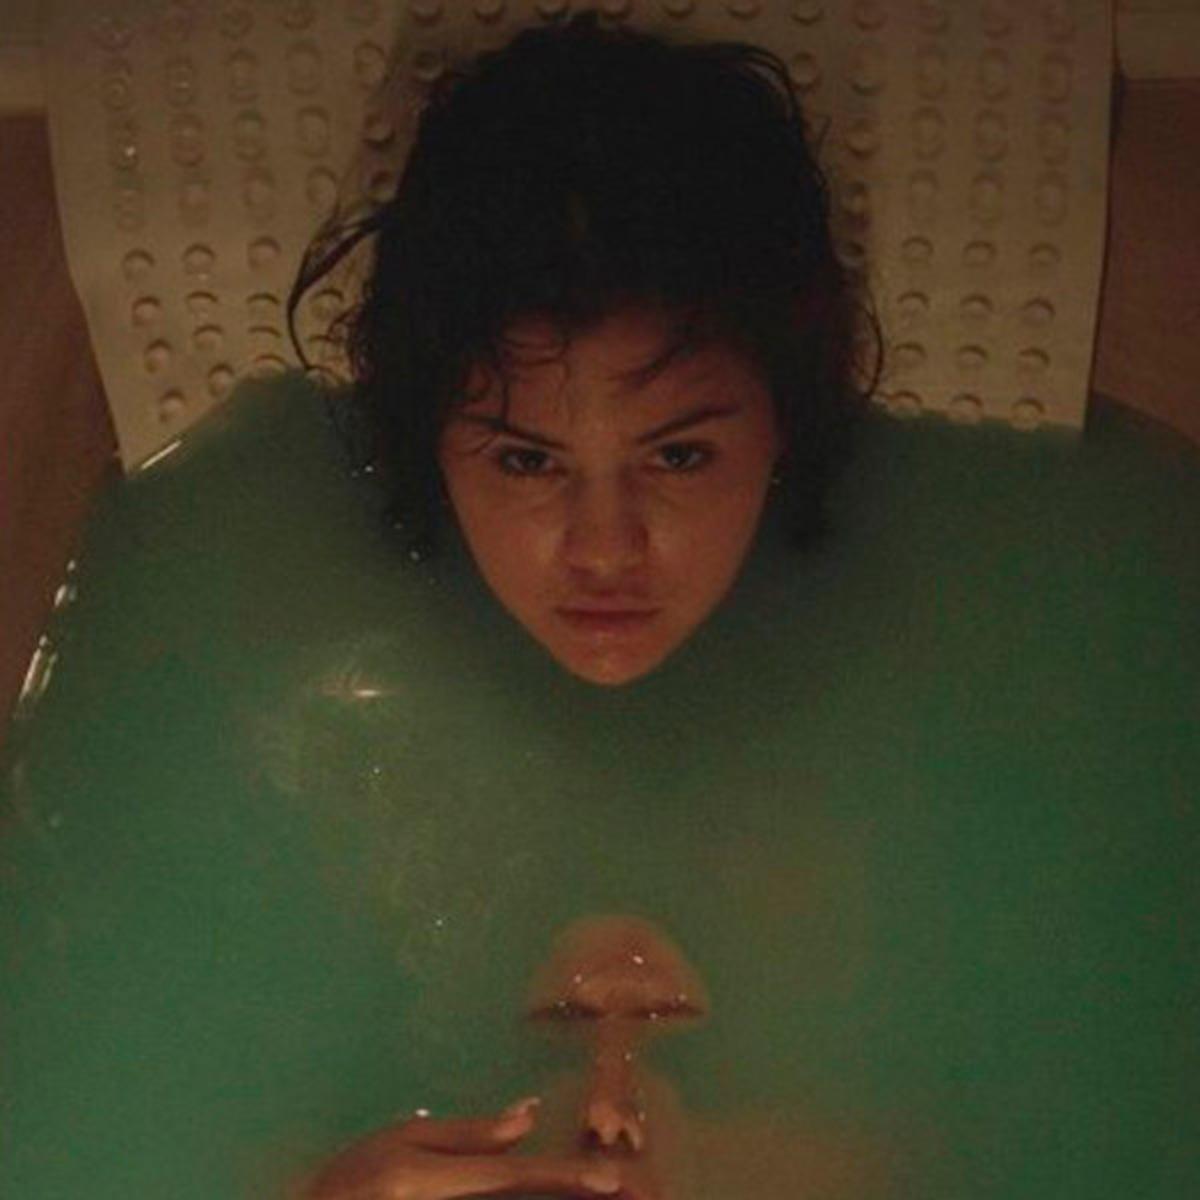 Gomez bath selena Watch Selena